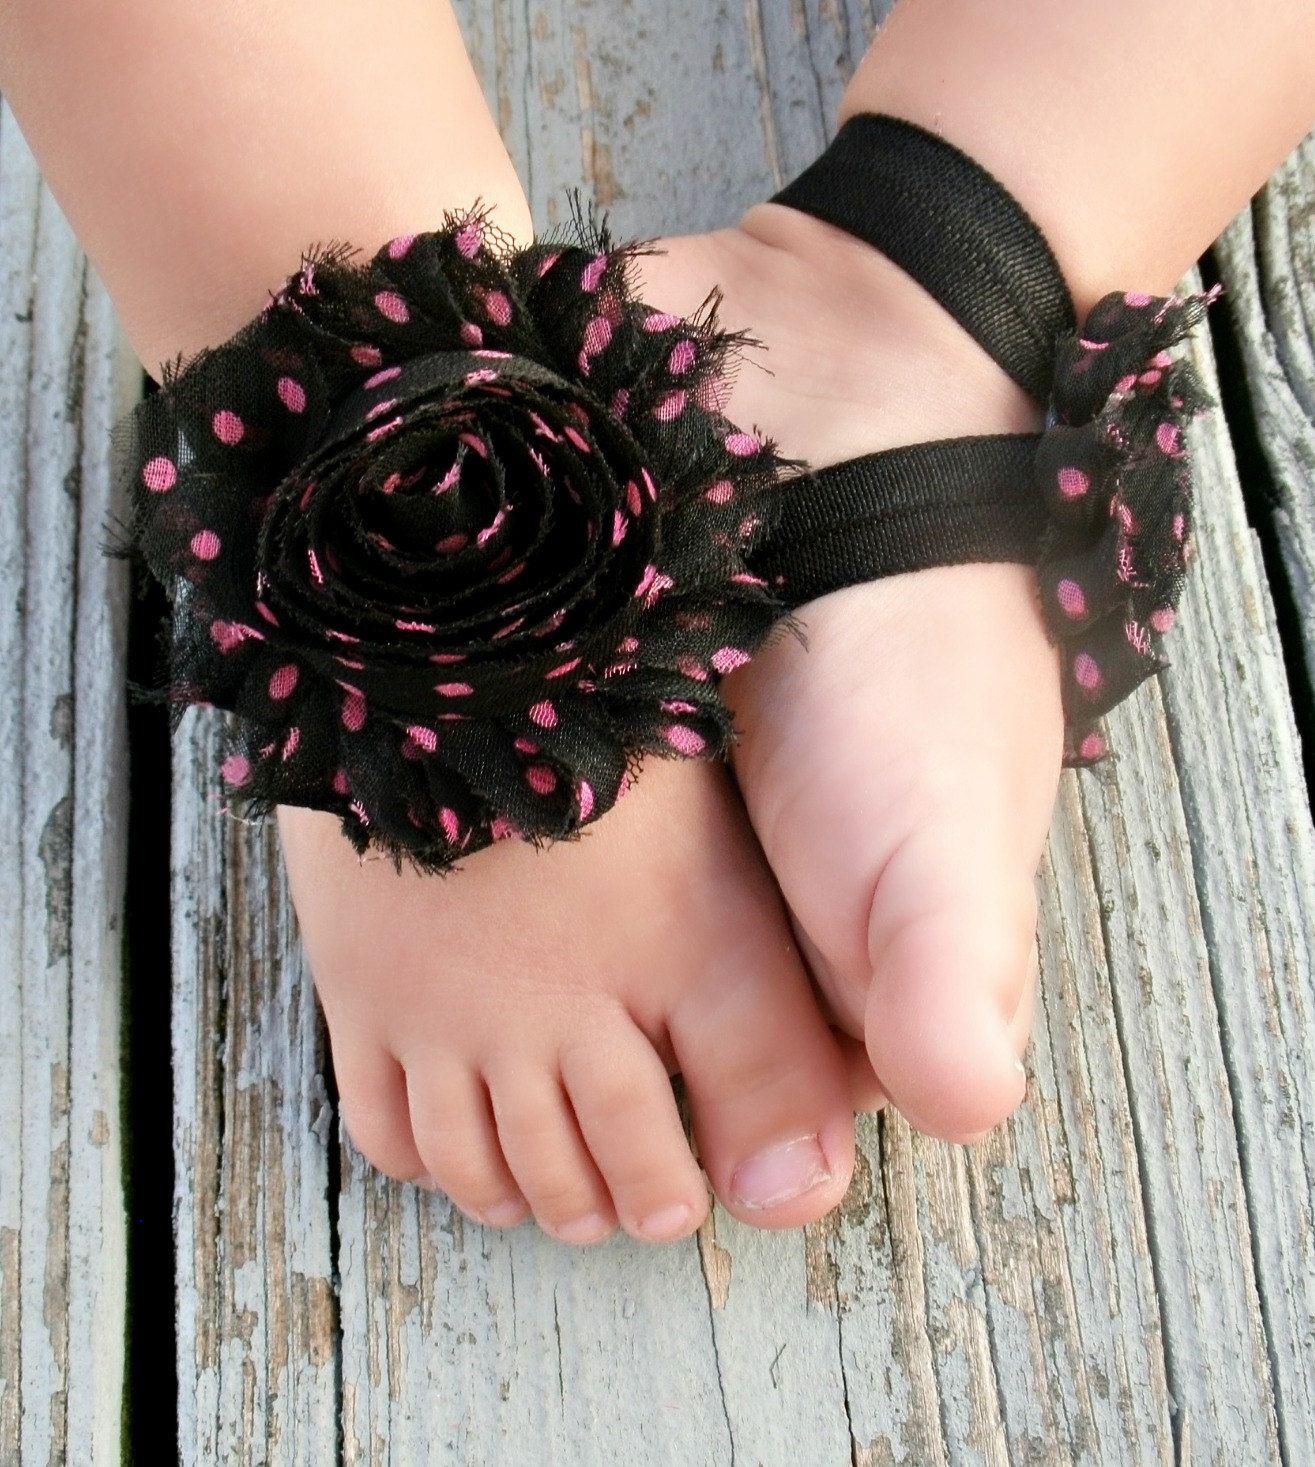 Black newborn sandals - Black With Pink Polka Dots Toddler Sandals Newborn Sandals Baby Flower Sandals